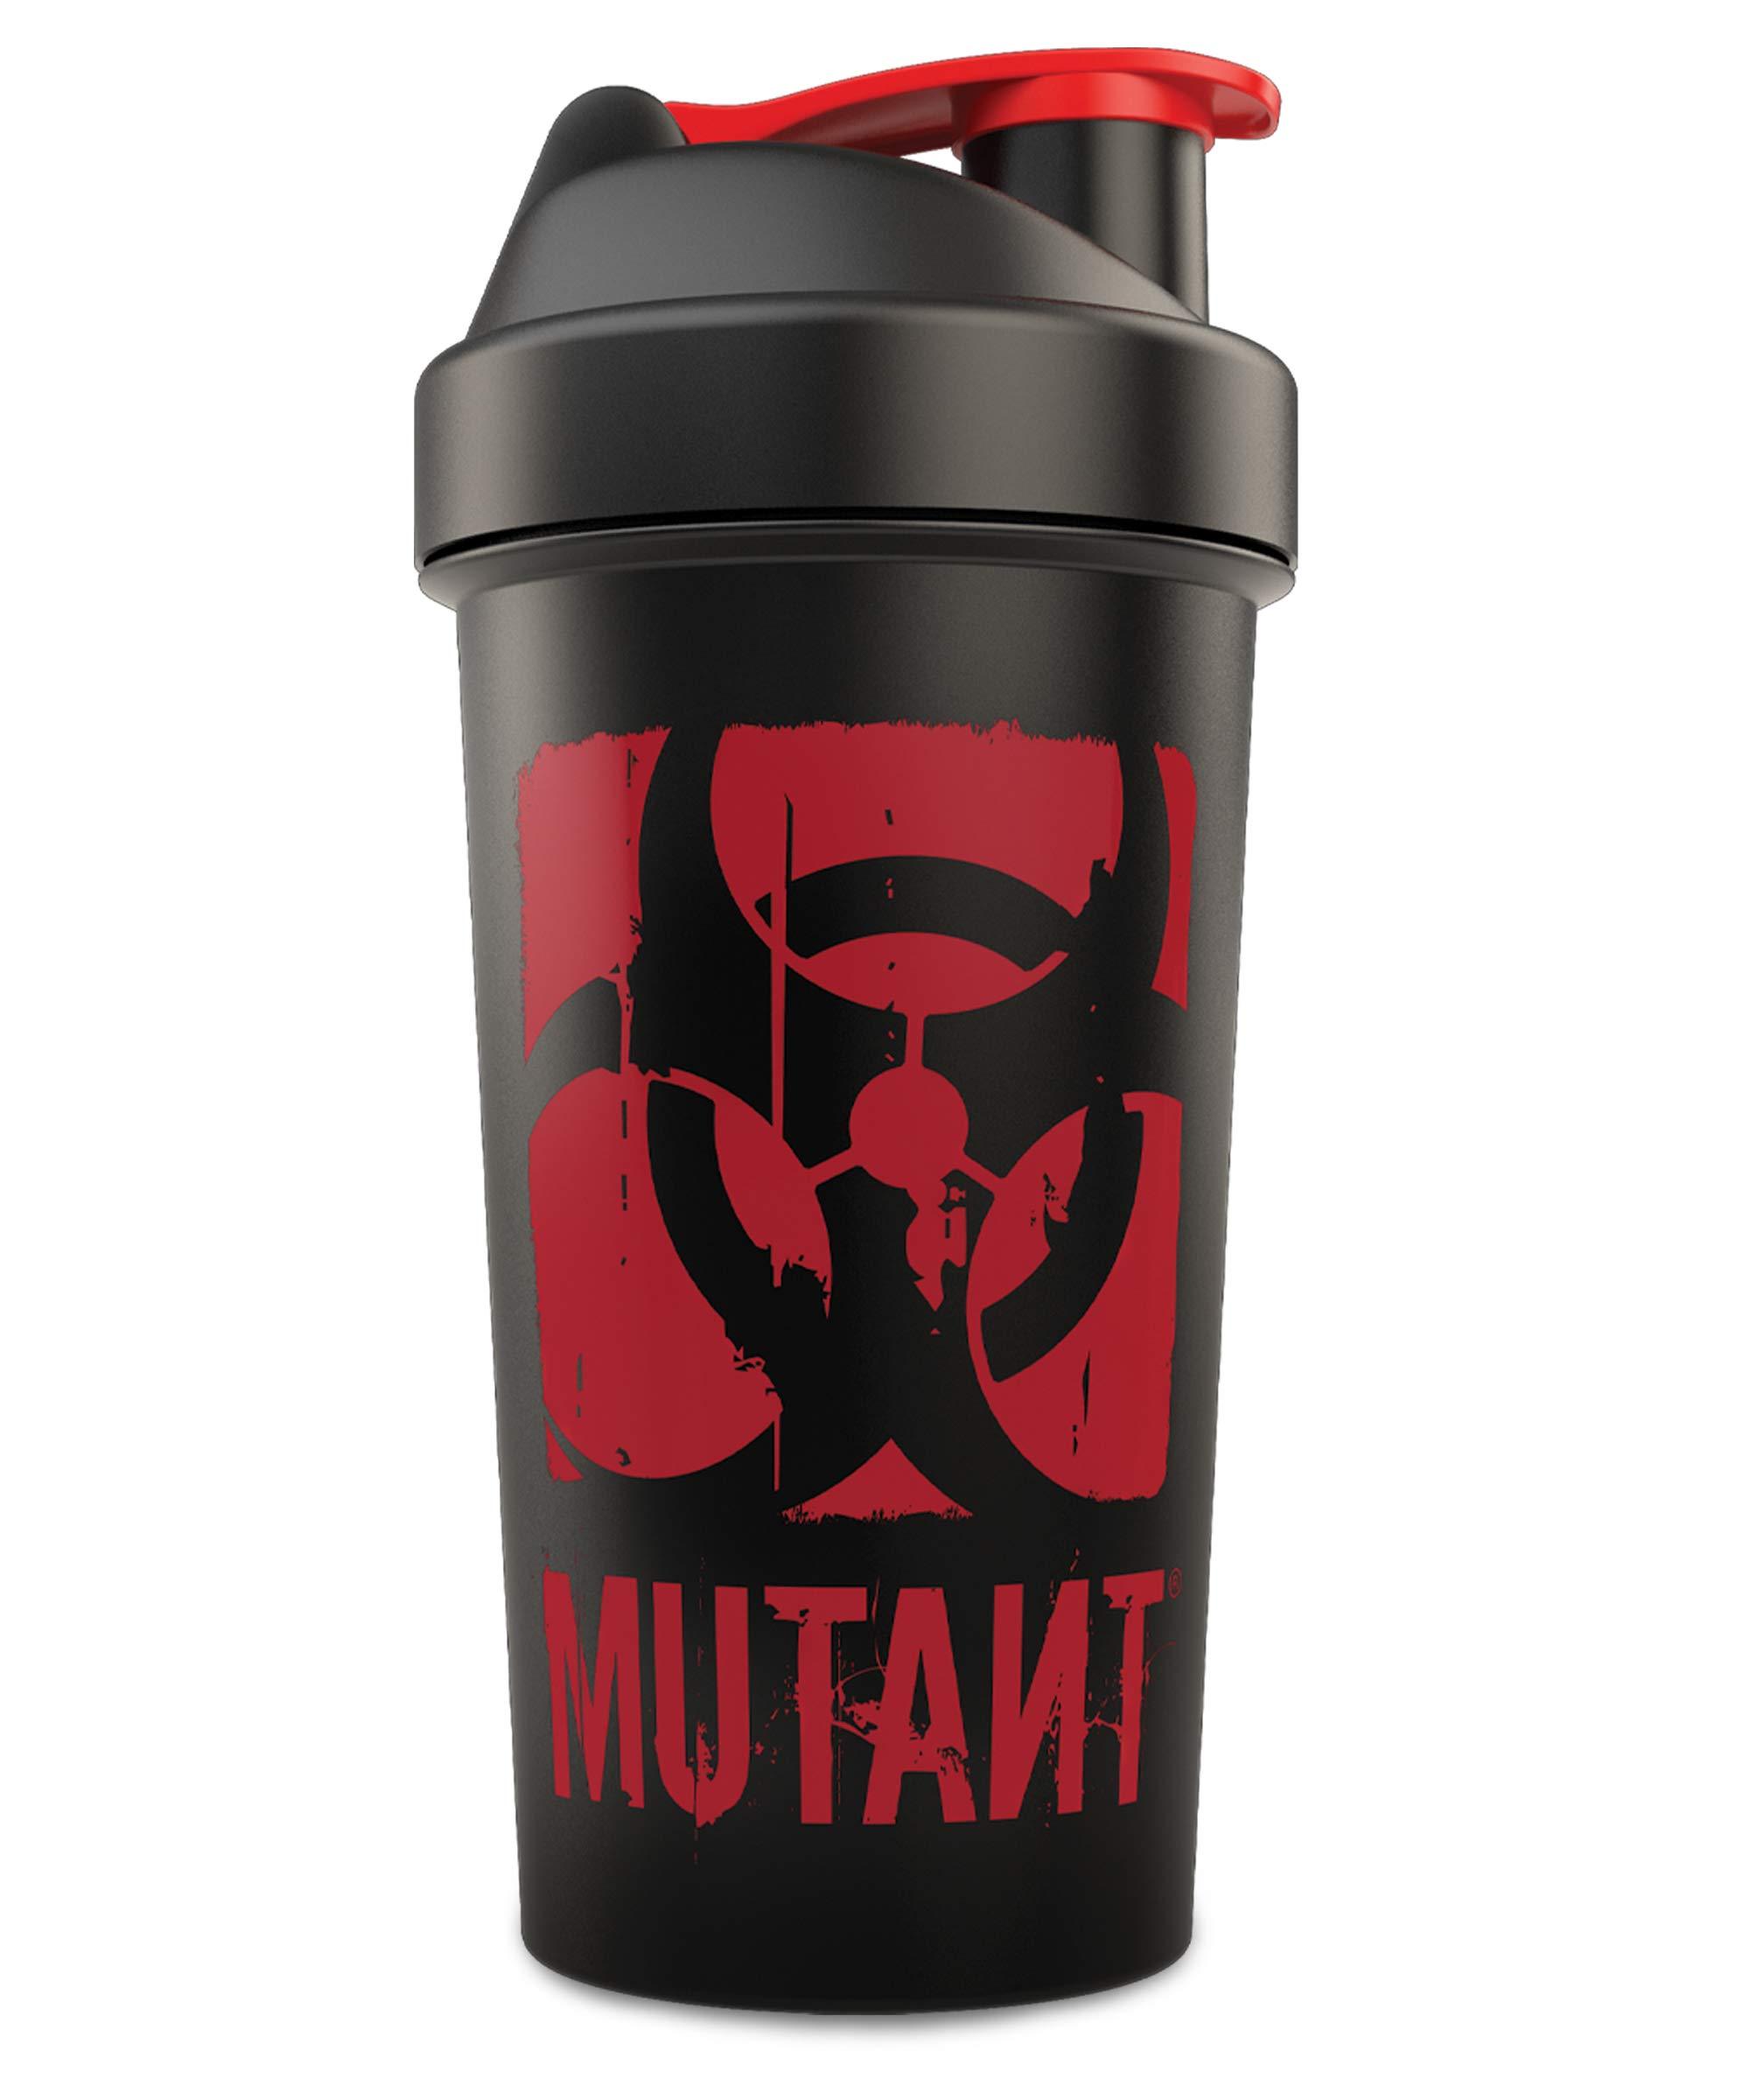 MUTANT Nation Black Shaker Cup Official Blender Cup - Leak prove - eco-friendly - 800 ML